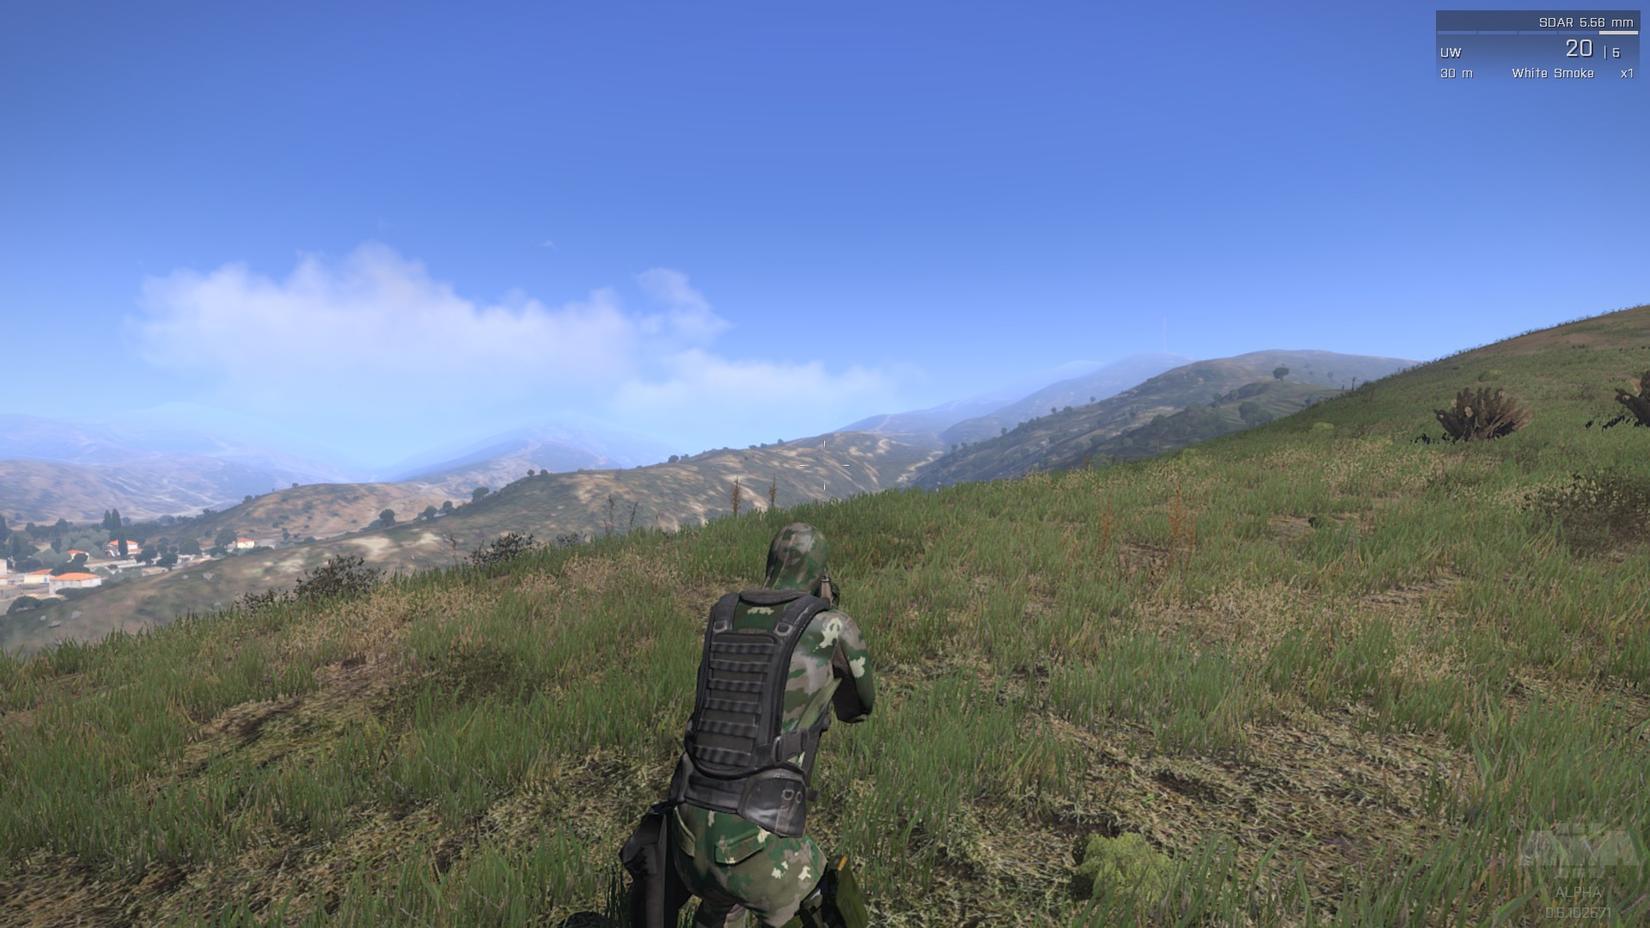 Arma 3 mission ideas - SimHQ Forums